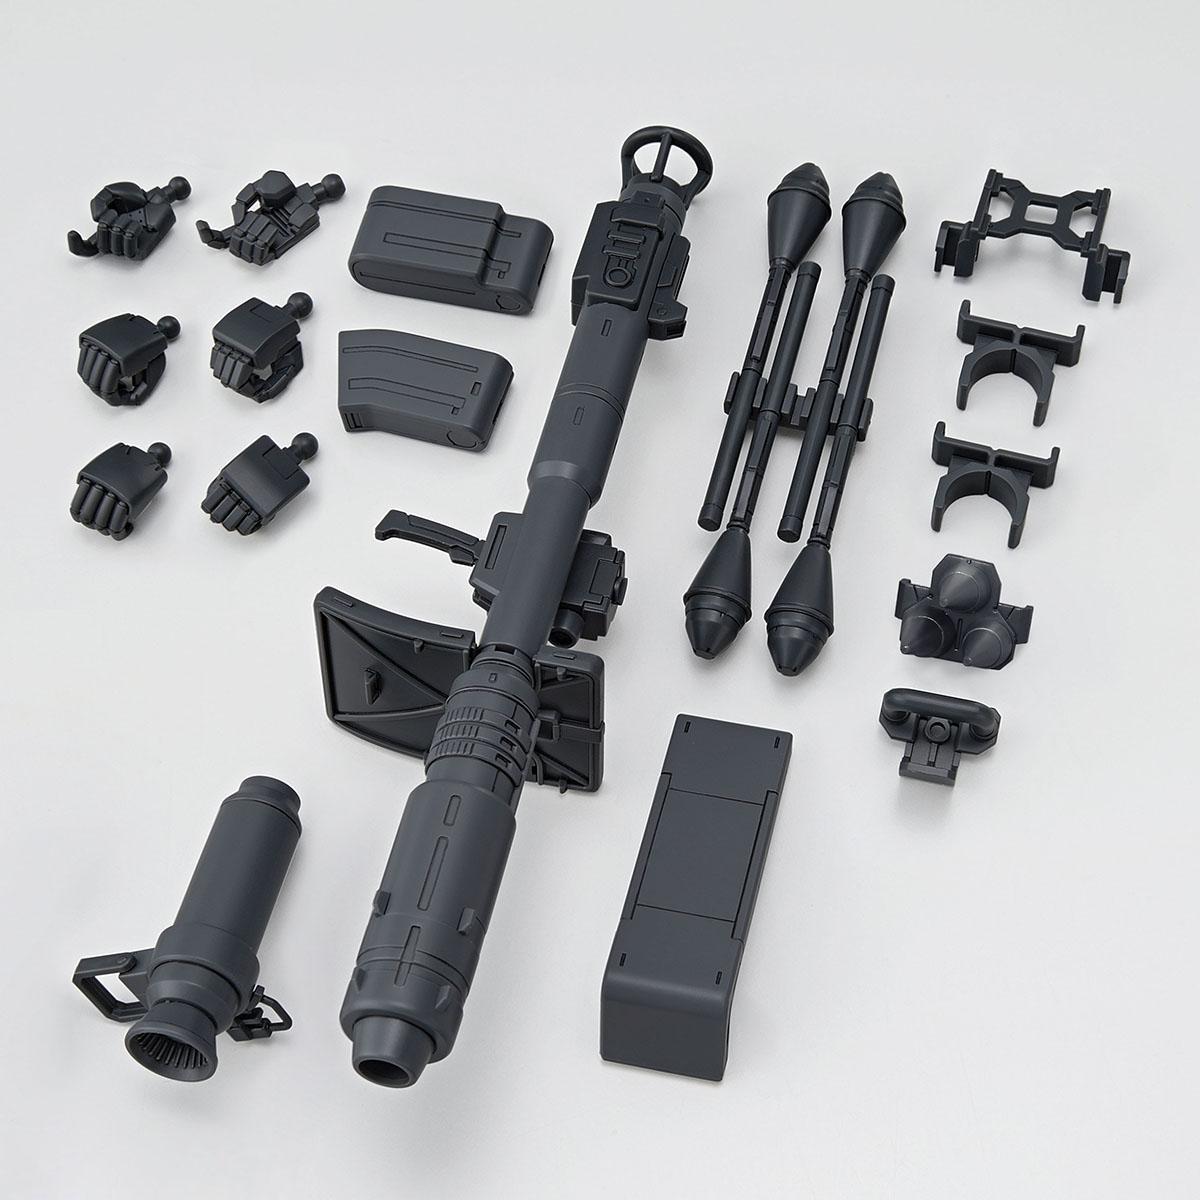 1/144 THE GUNDAM BASE LIMITED SYSTEM WEAPON KIT 006